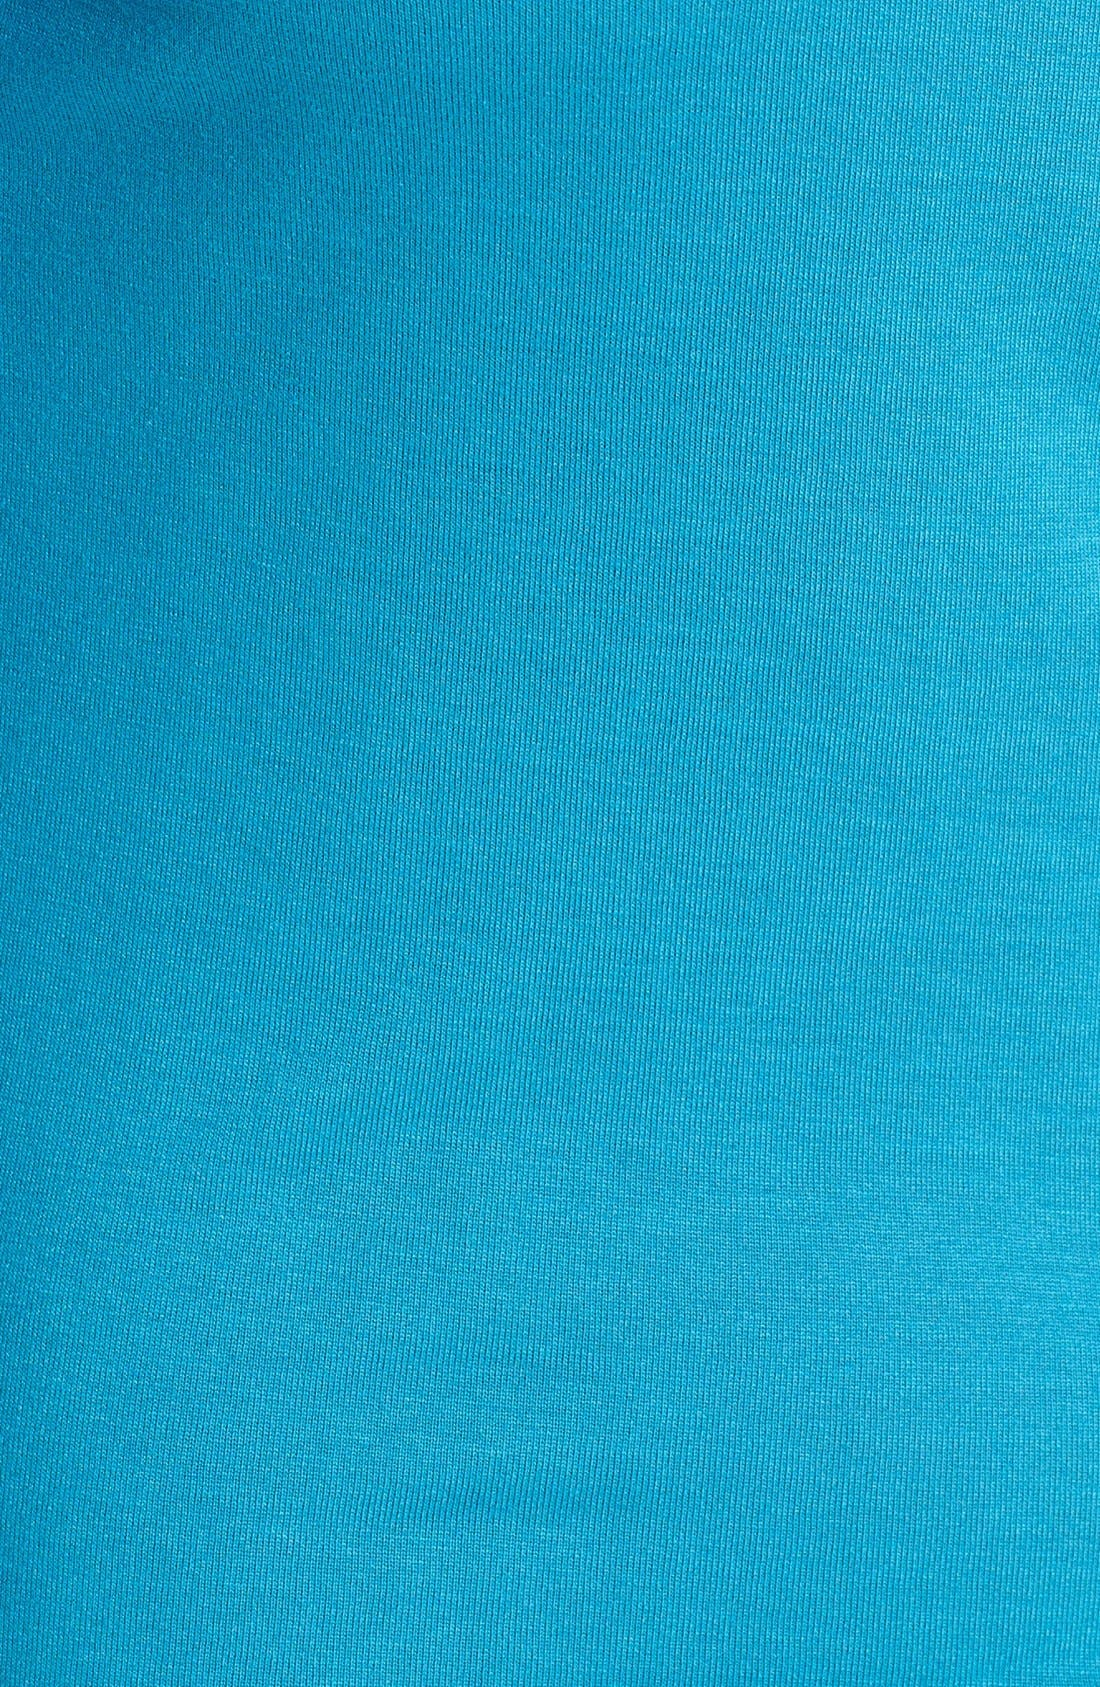 Alternate Image 3  - Halogen® Long Sleeve Jersey Tee